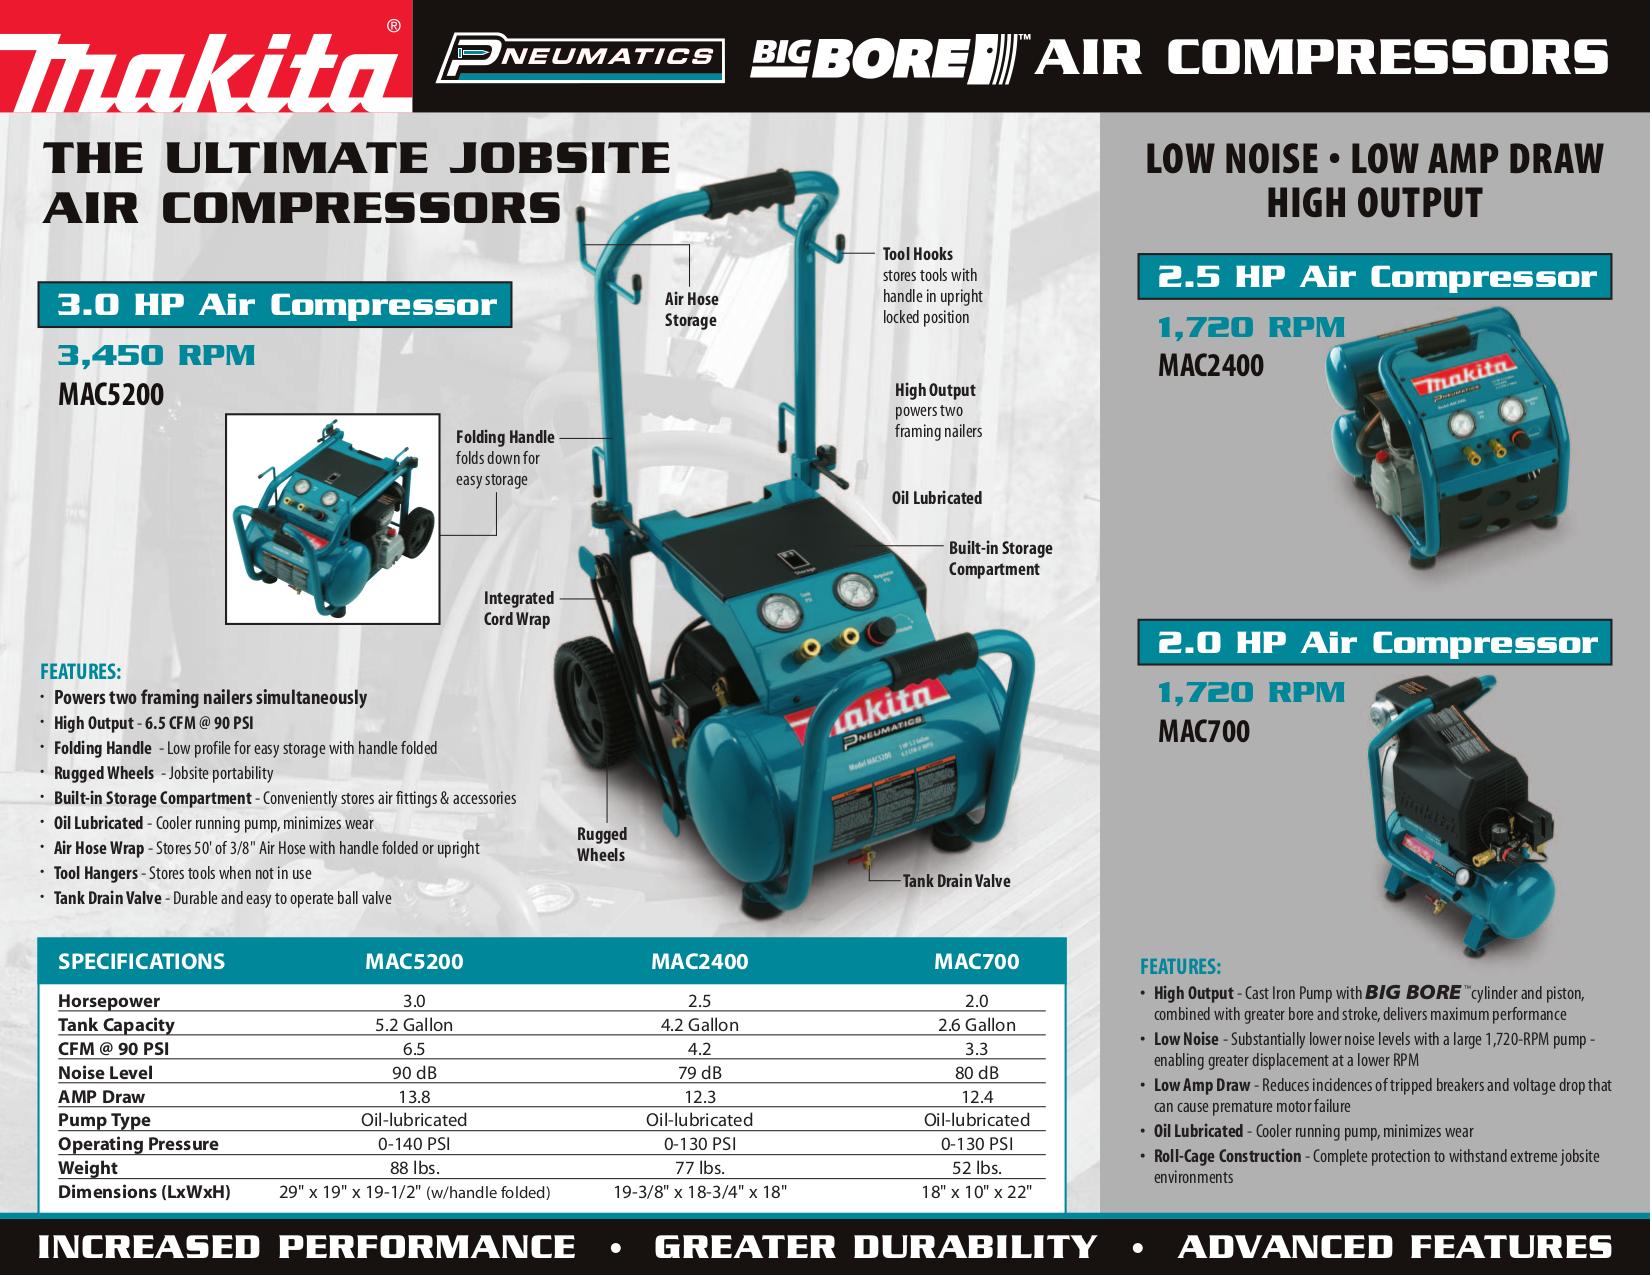 Download free pdf for Makita MAC700 Air Compressor Other manual